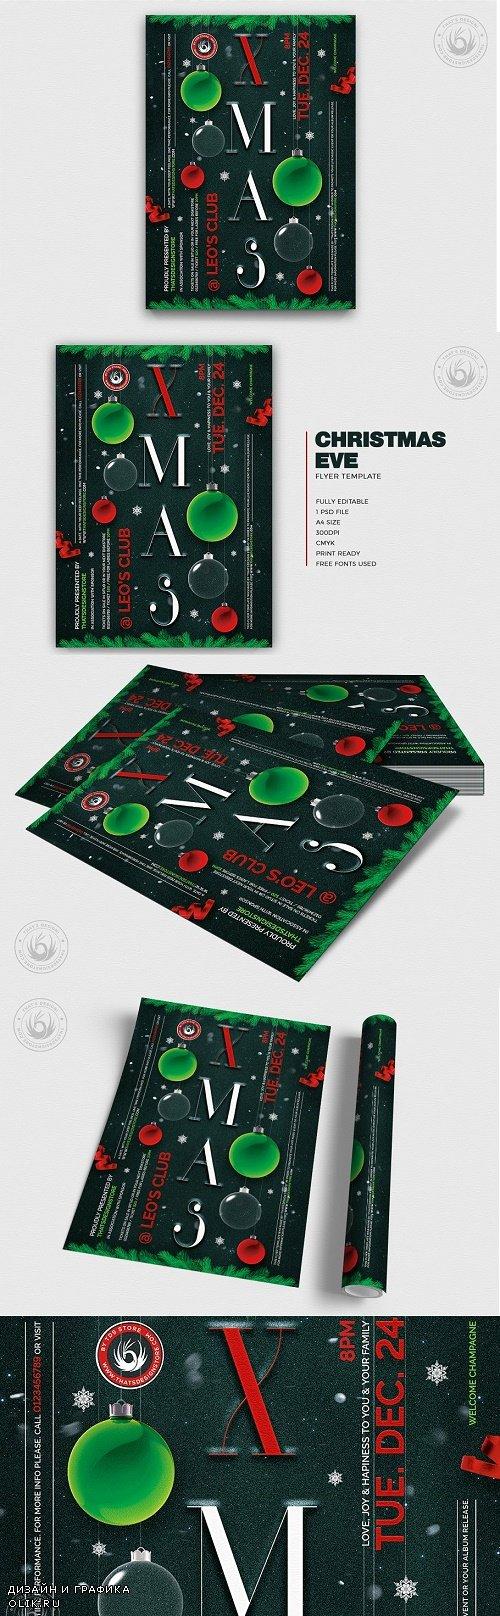 Christmas Eve Flyer Template V13 25020105 - 4278476